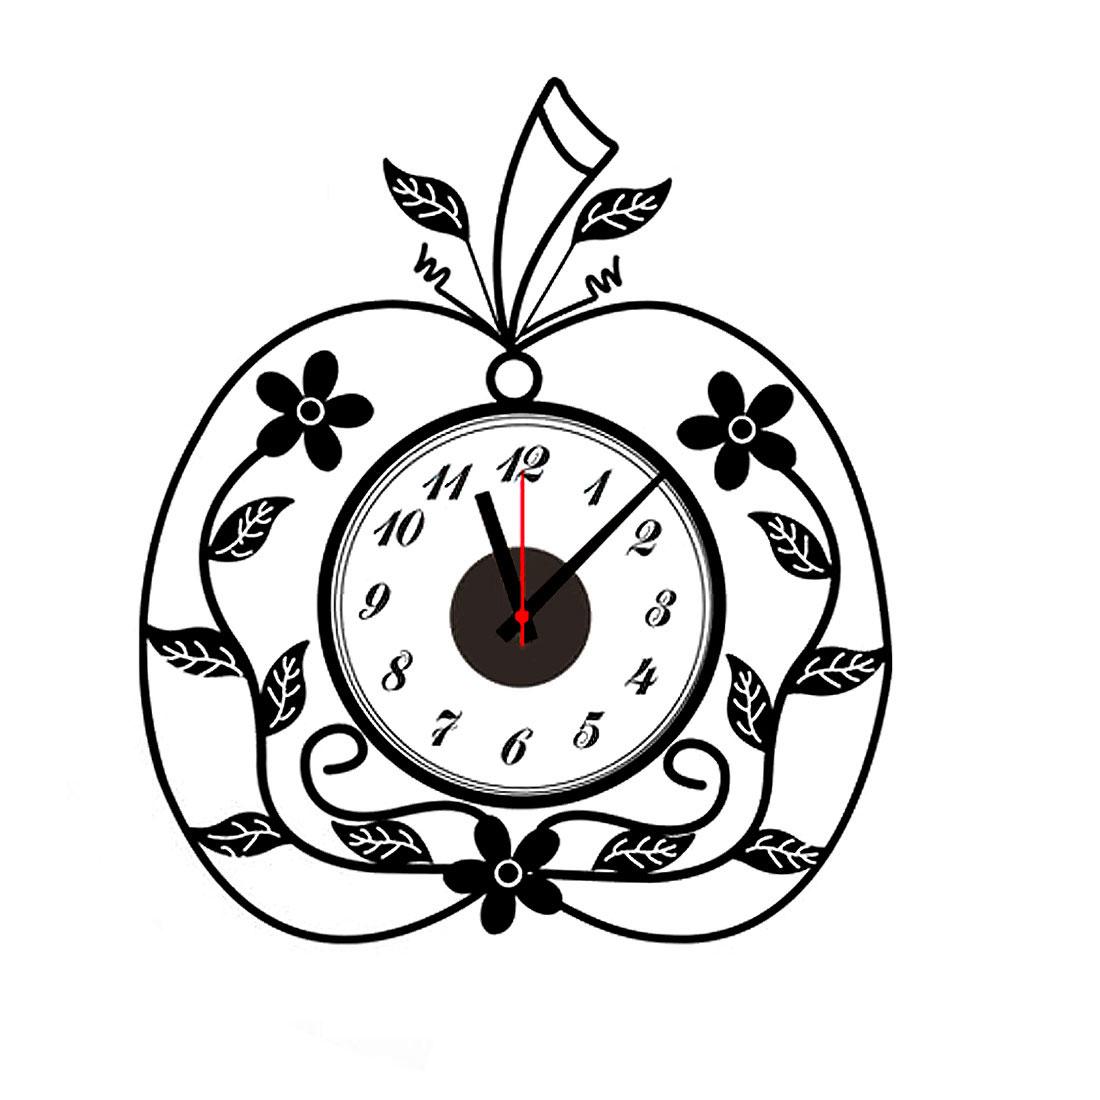 Home Living Room Apple Print DIY Self-adhesive Removable Wall Sticker Decor Clock